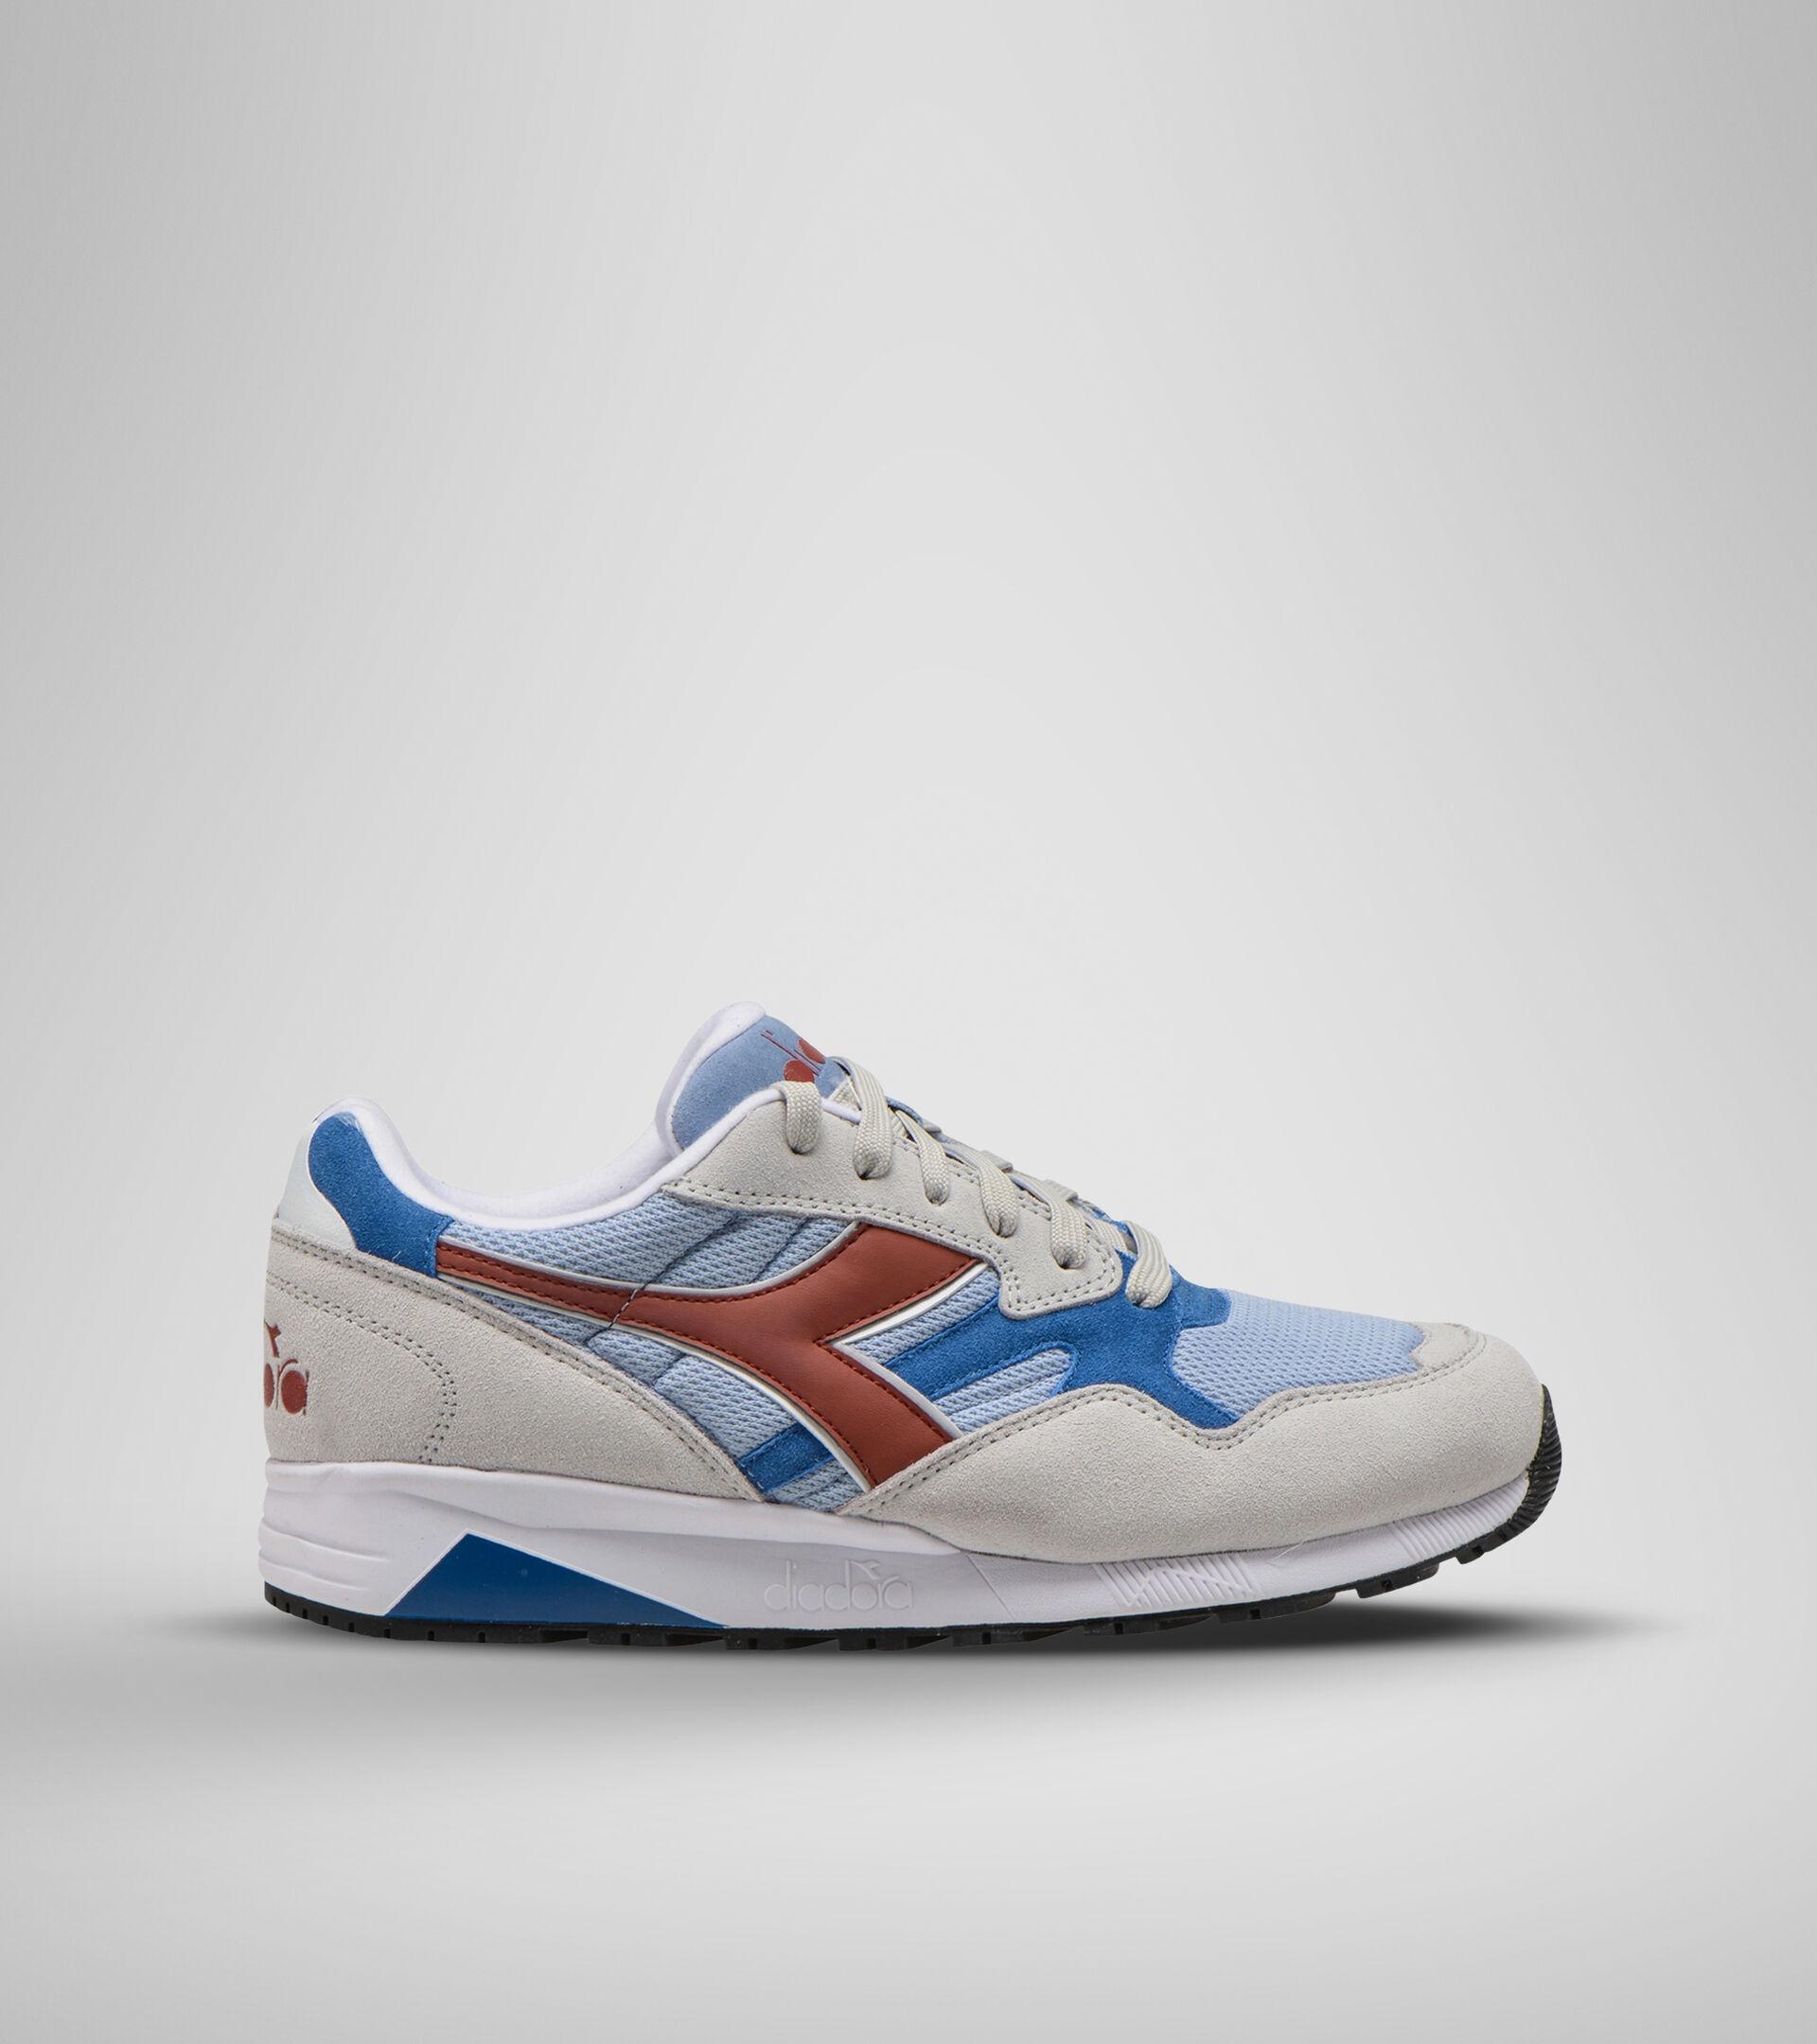 Footwear Sportswear UNISEX N902 S GR AURORA/RSSO FLUO METAL/BL M Diadora